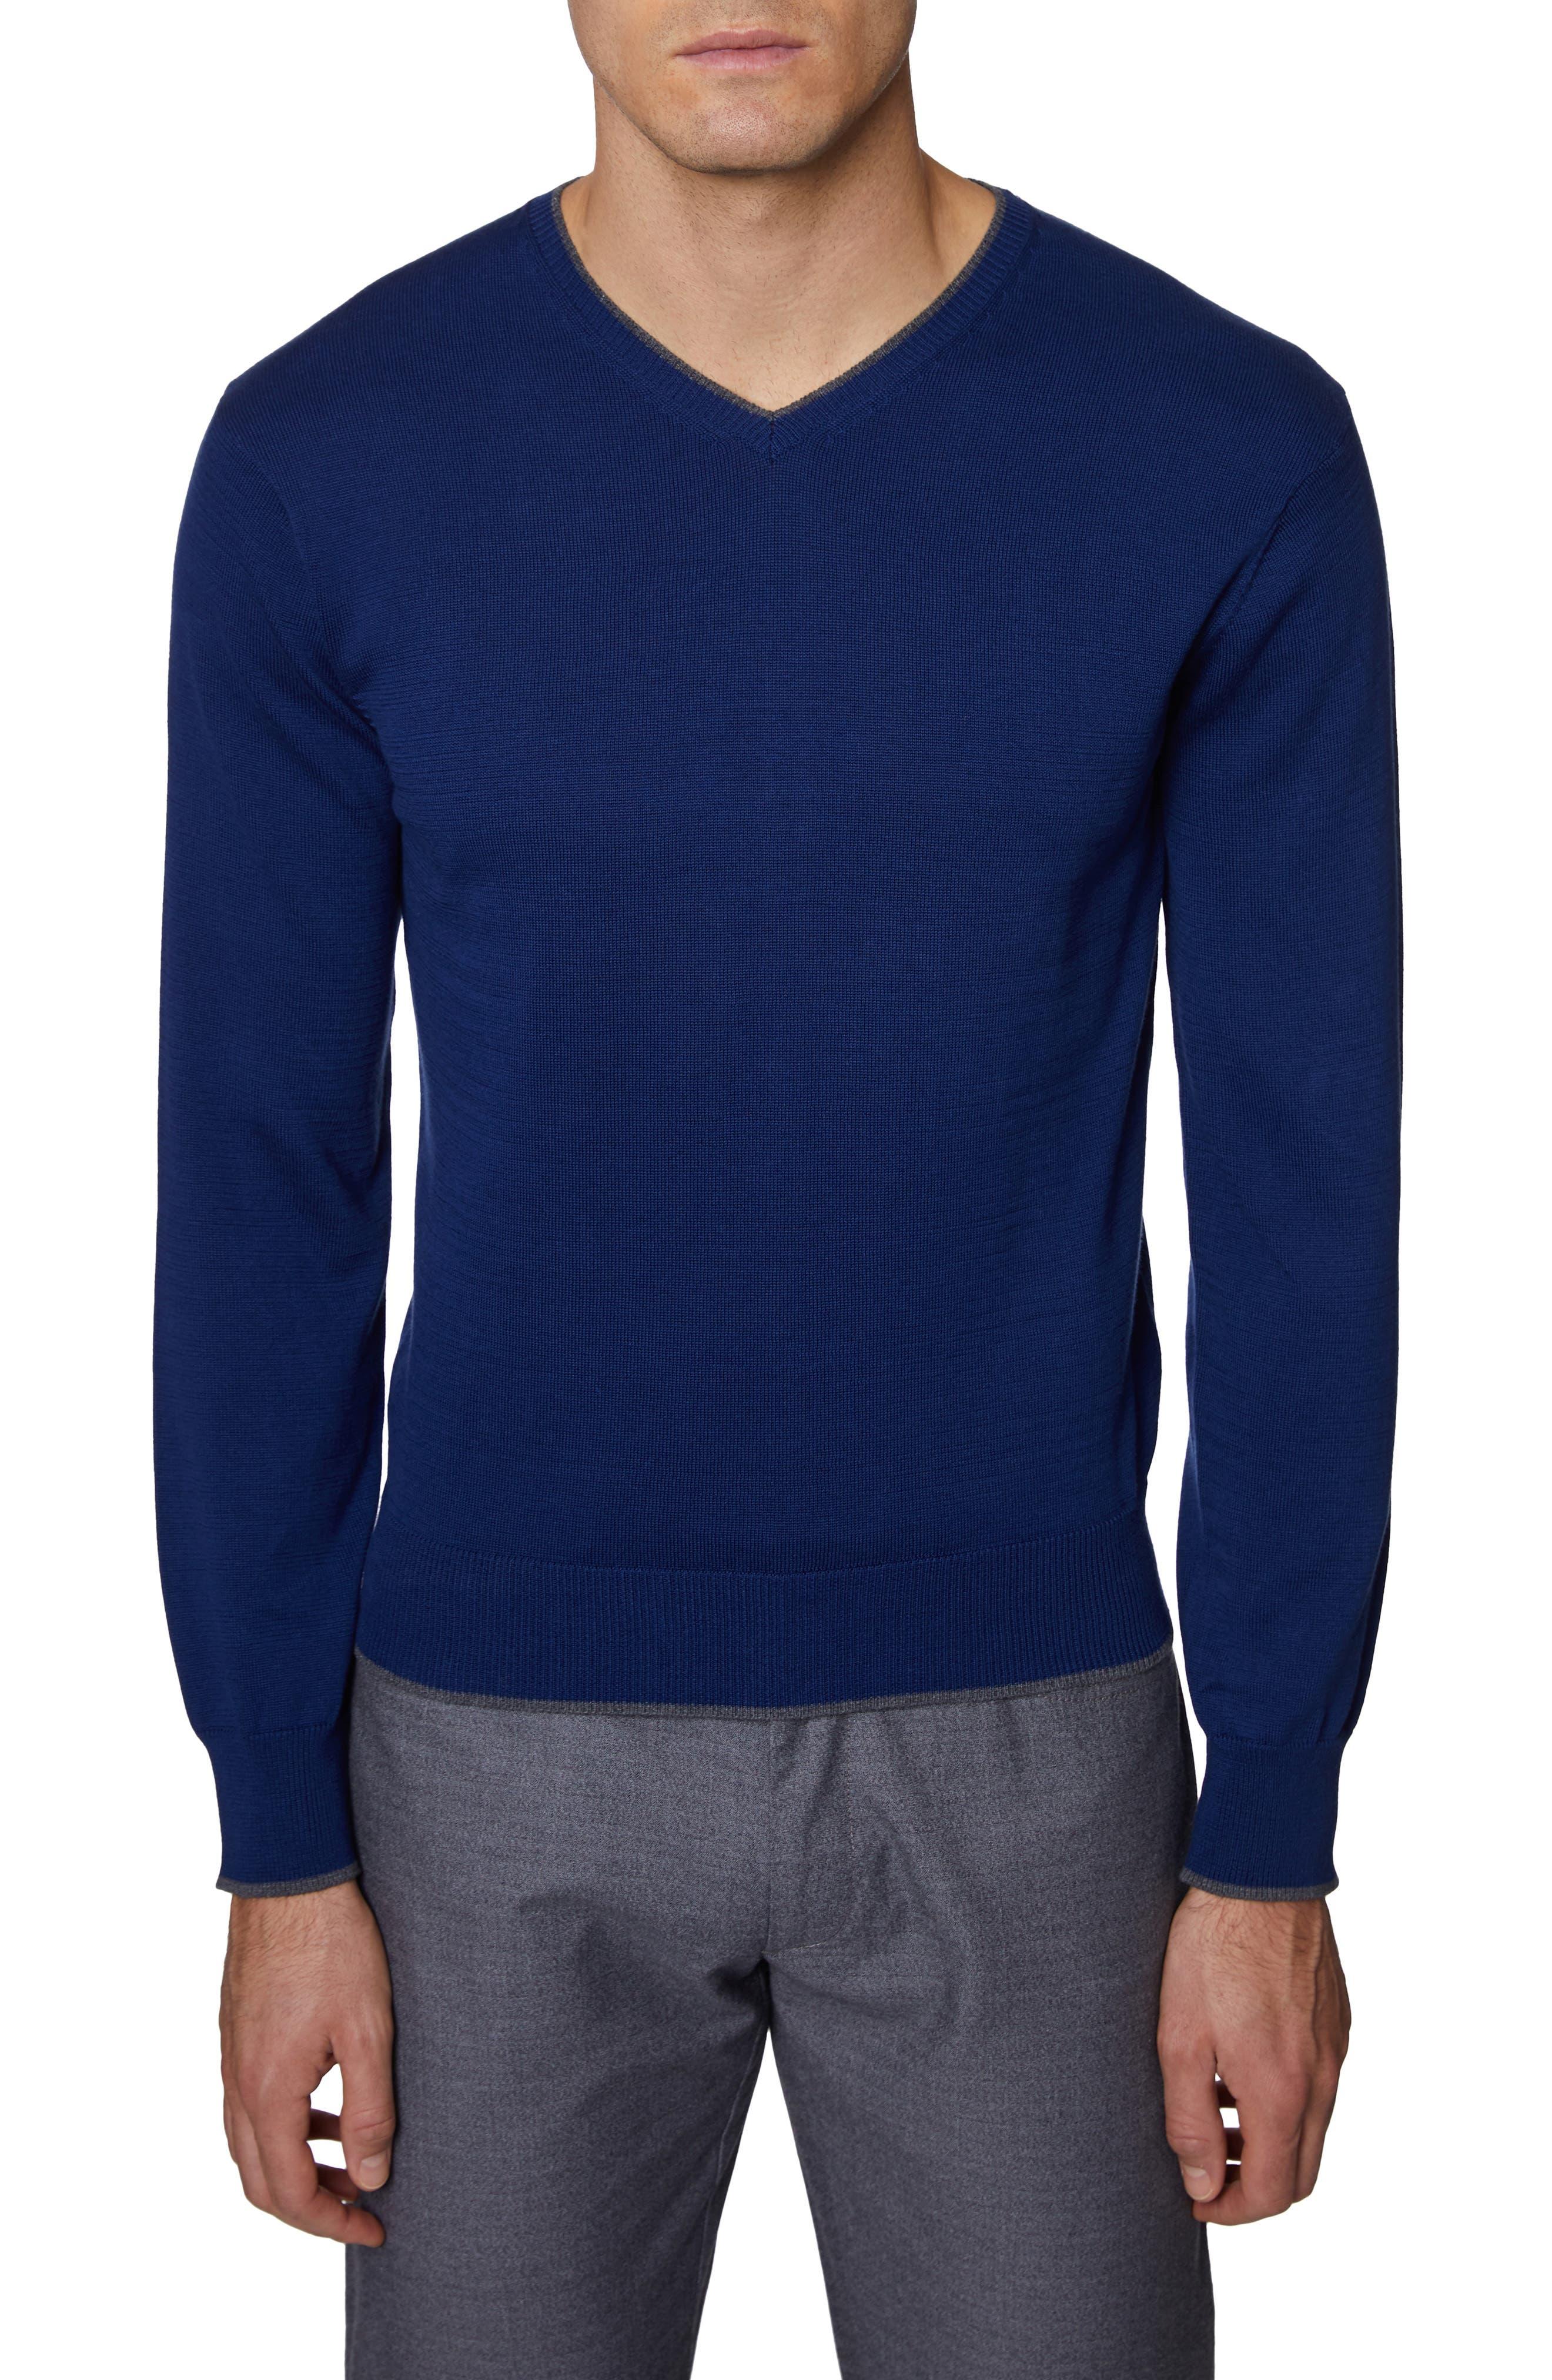 Hickey Freeman V-Neck Cotton Sweater, Blue